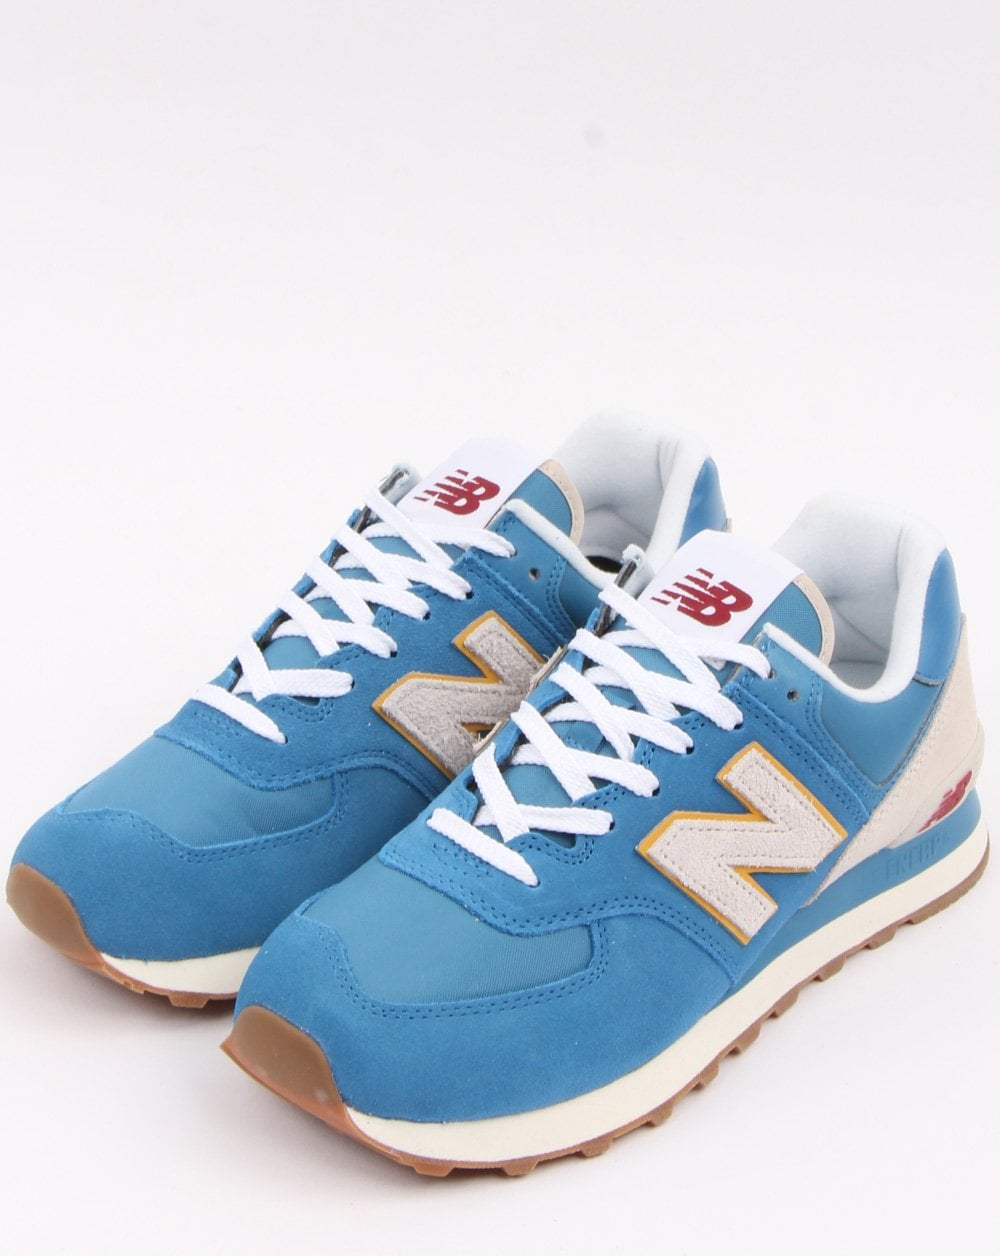 New Balance 574 Mako Blue